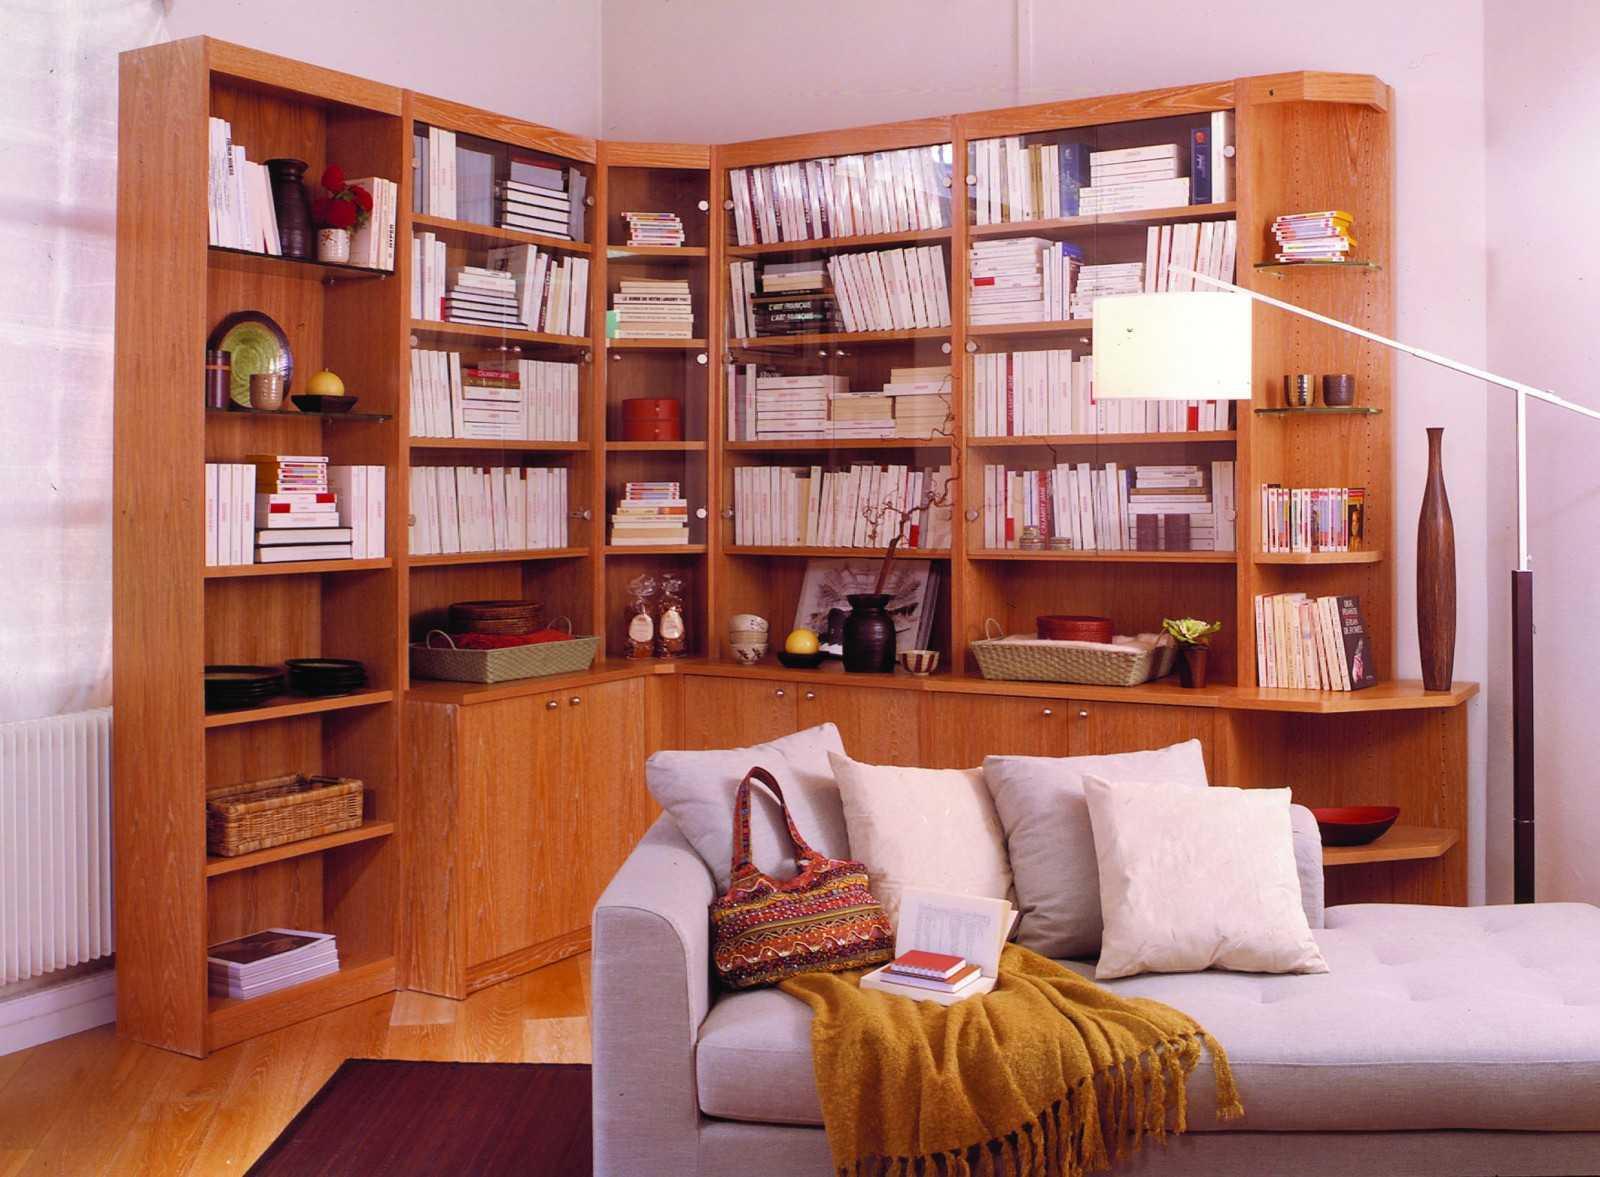 biblioth que encyclopedia la maison des bibliotheques. Black Bedroom Furniture Sets. Home Design Ideas